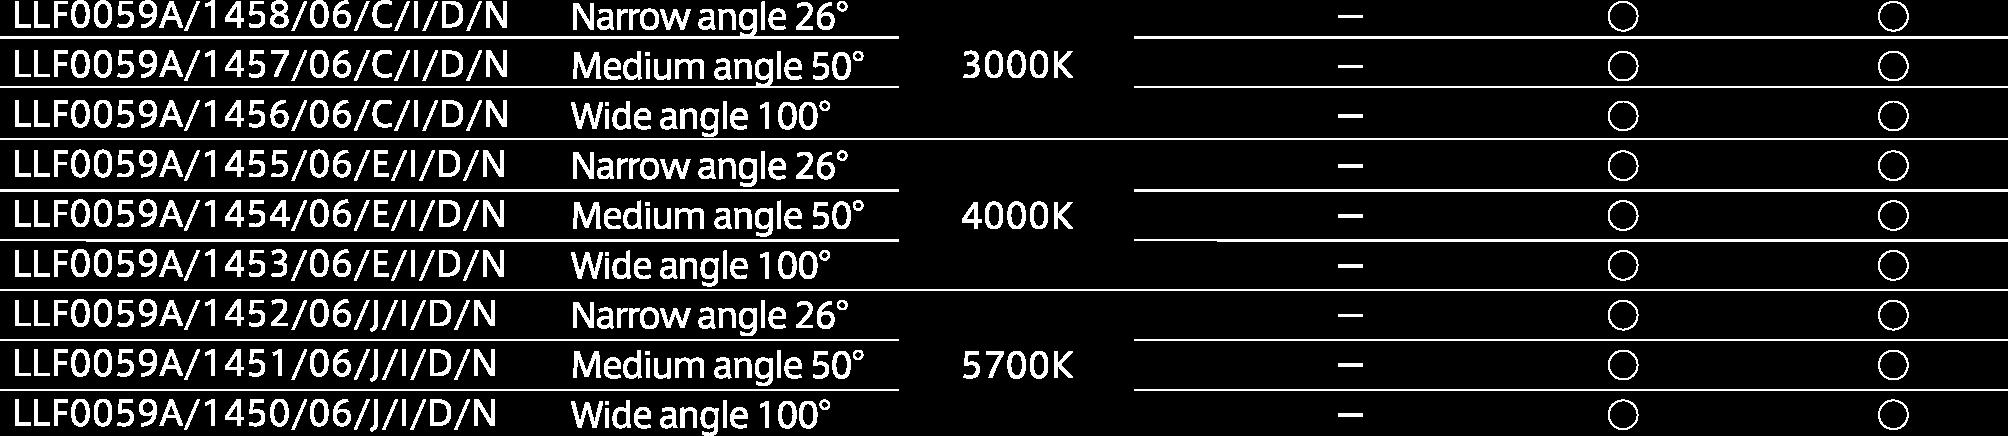 LLF0059A spec list